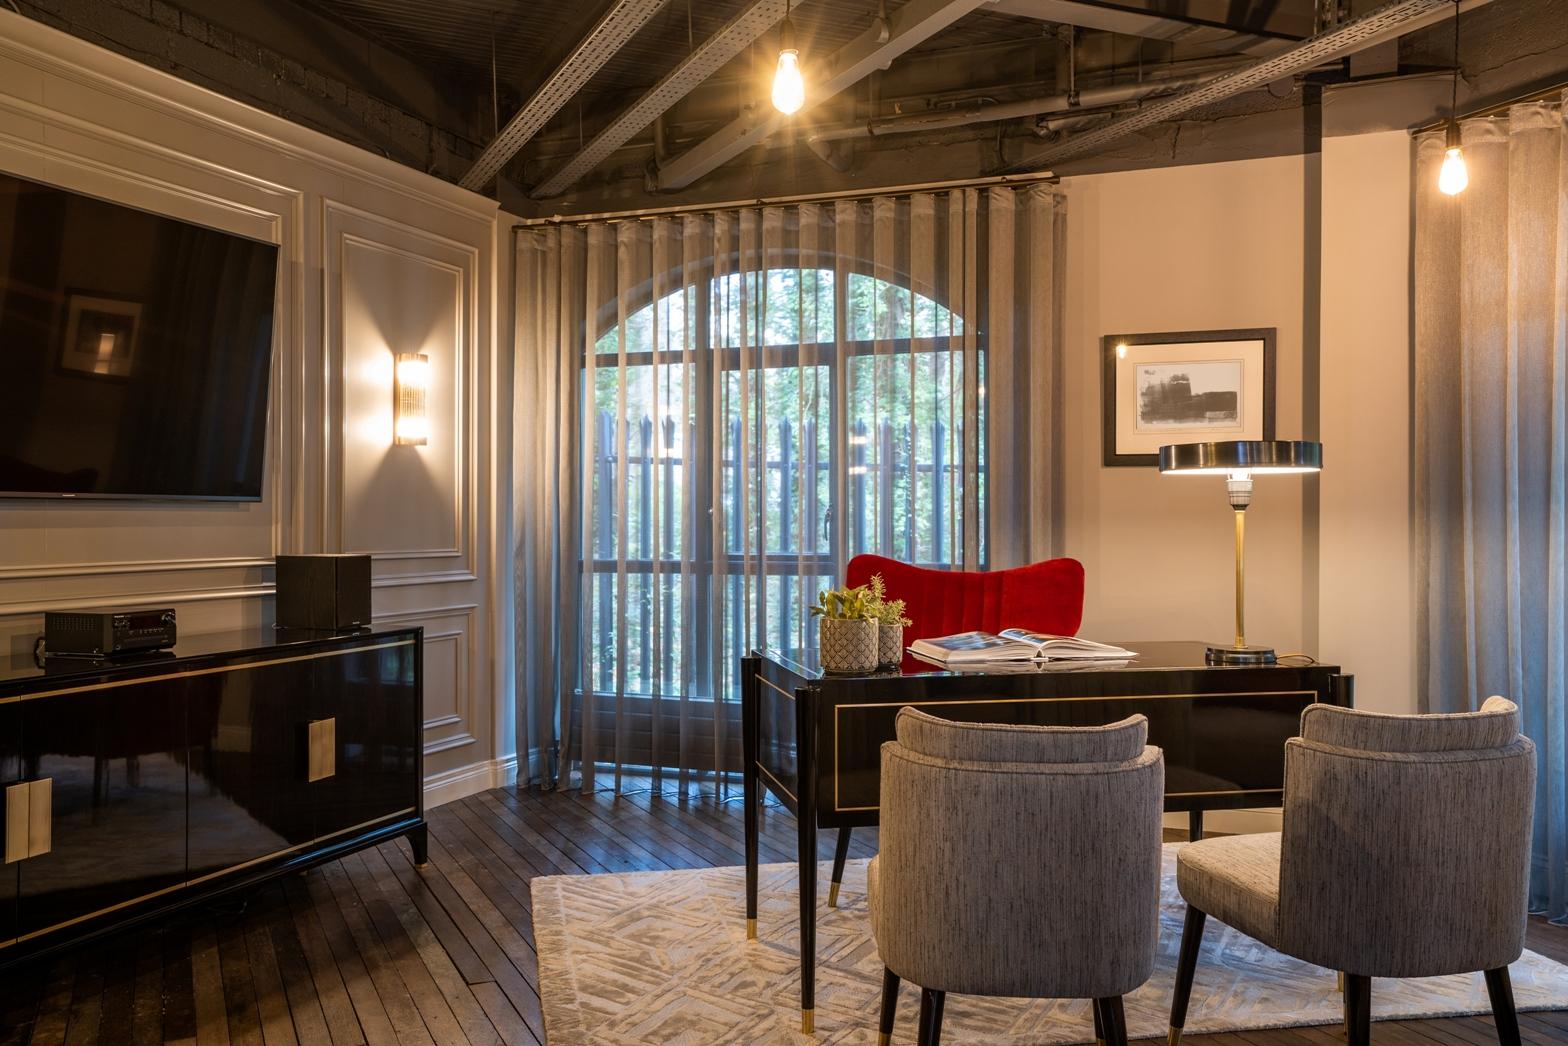 lee-austin-interior-design-luxury-residential-commercial-ireland1.jpg